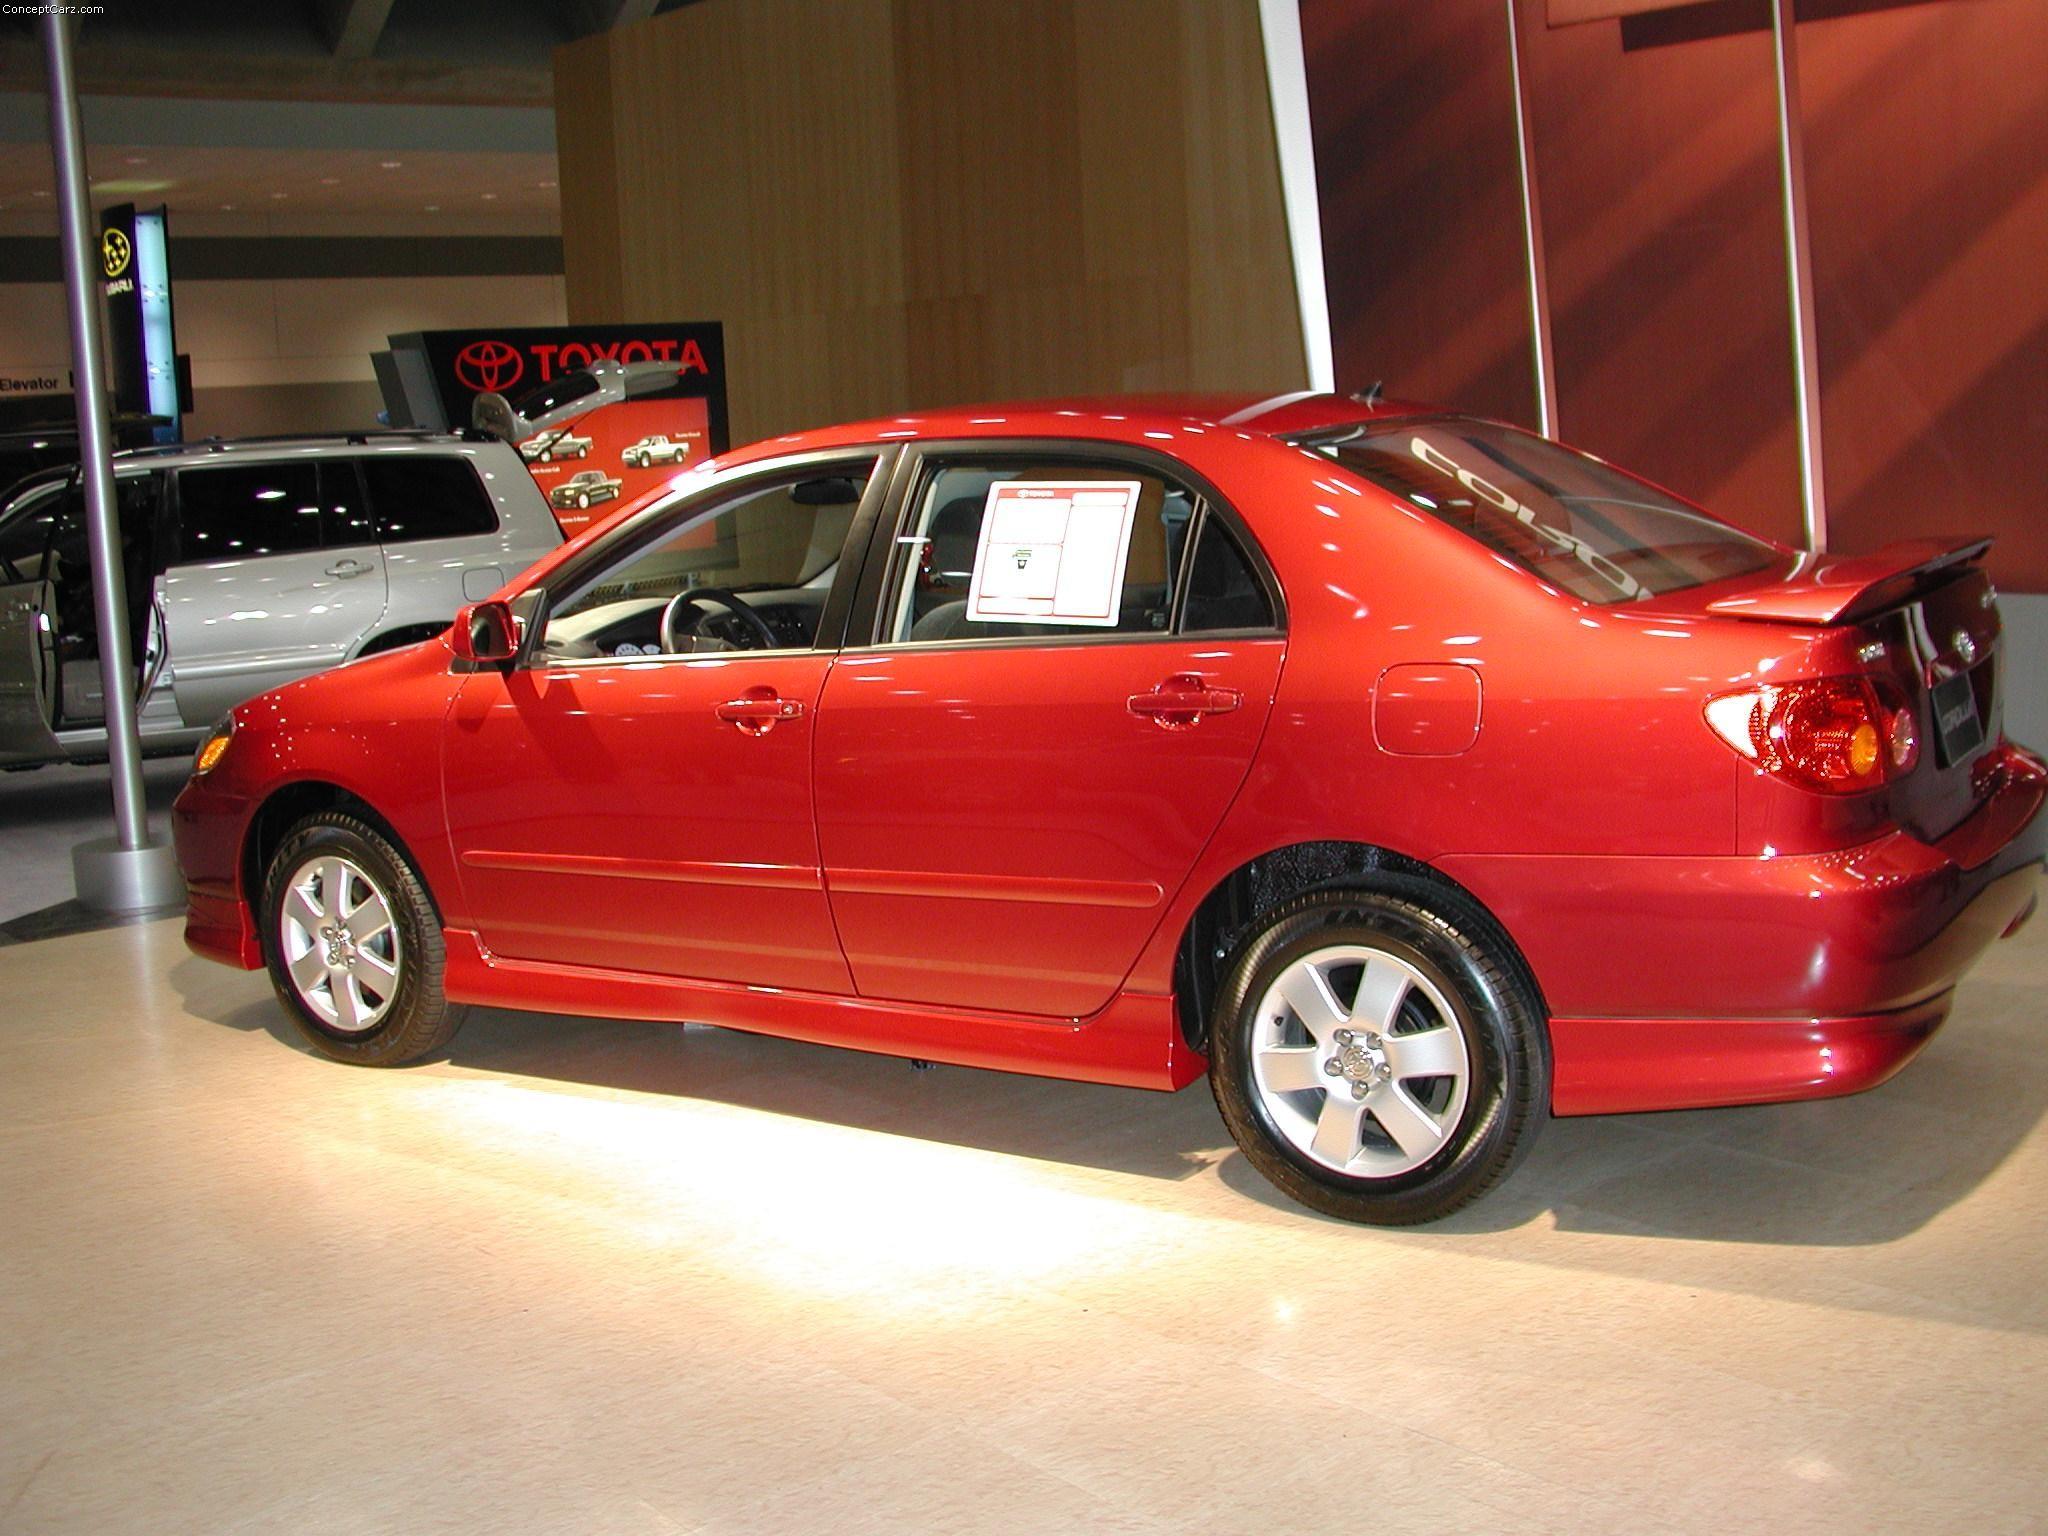 2002 Toyota Corolla Image. https://www.conceptcarz.com ...